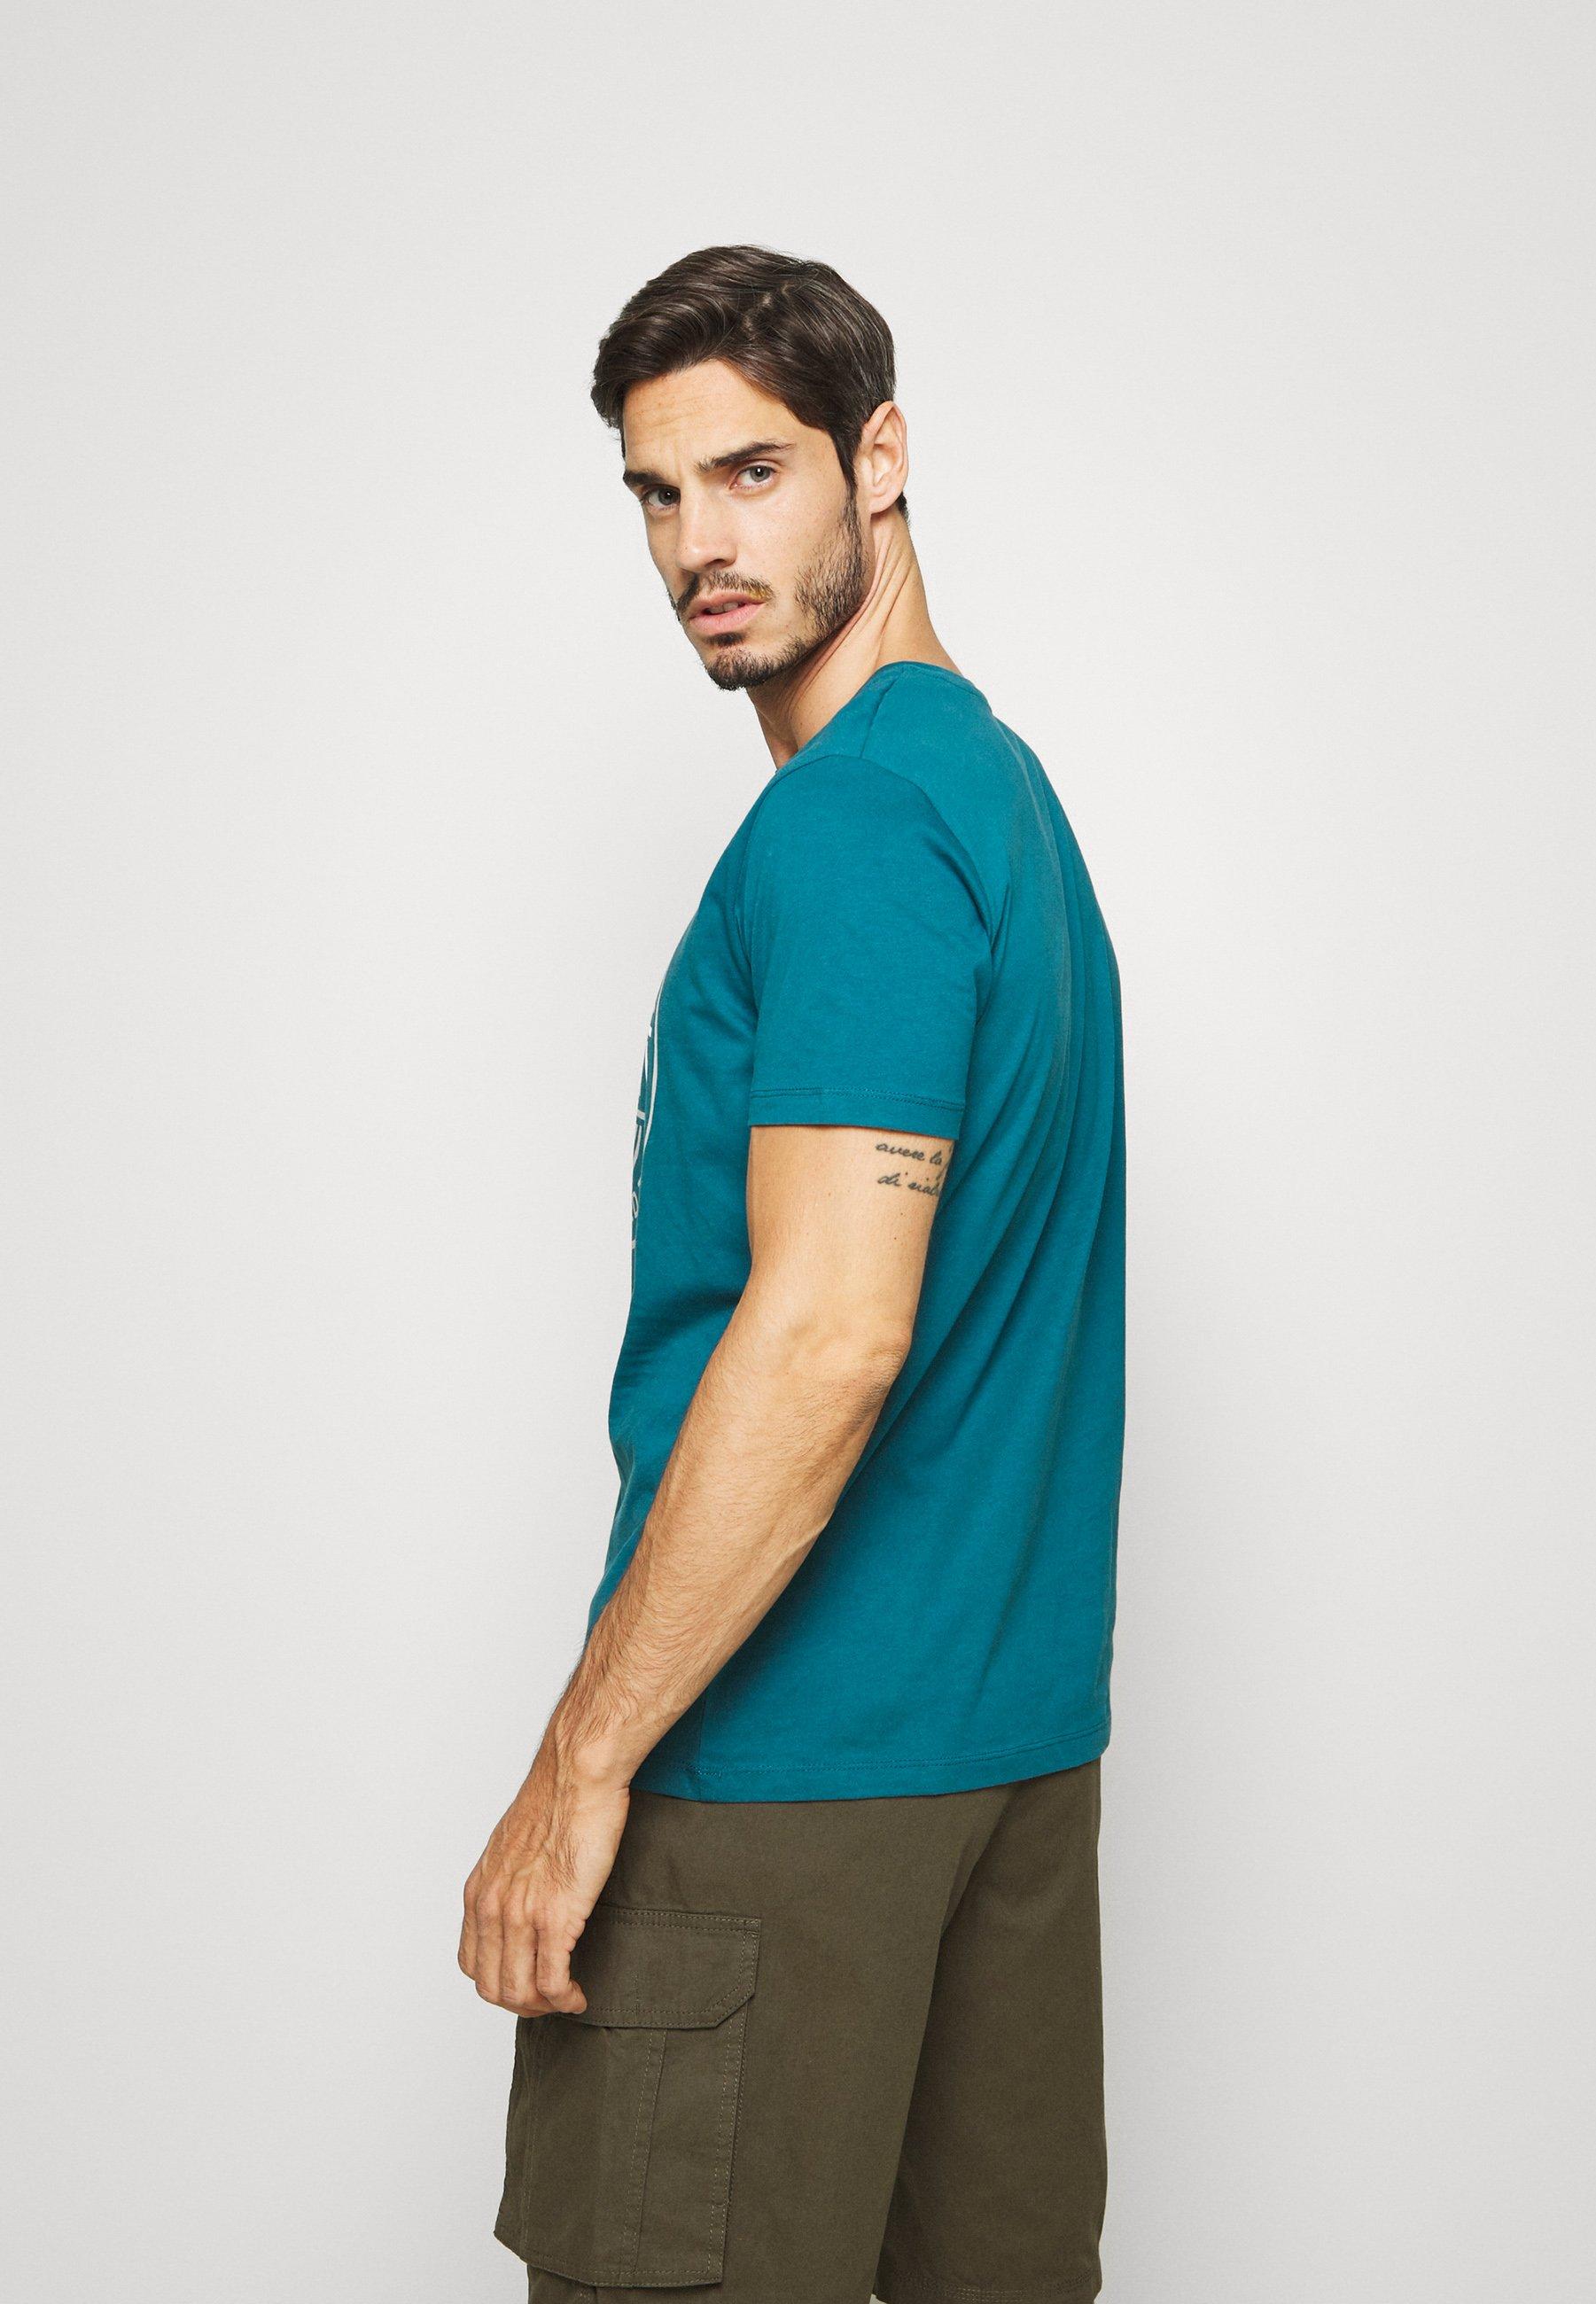 Esprit Print T-shirt - petrol blue TaSkv